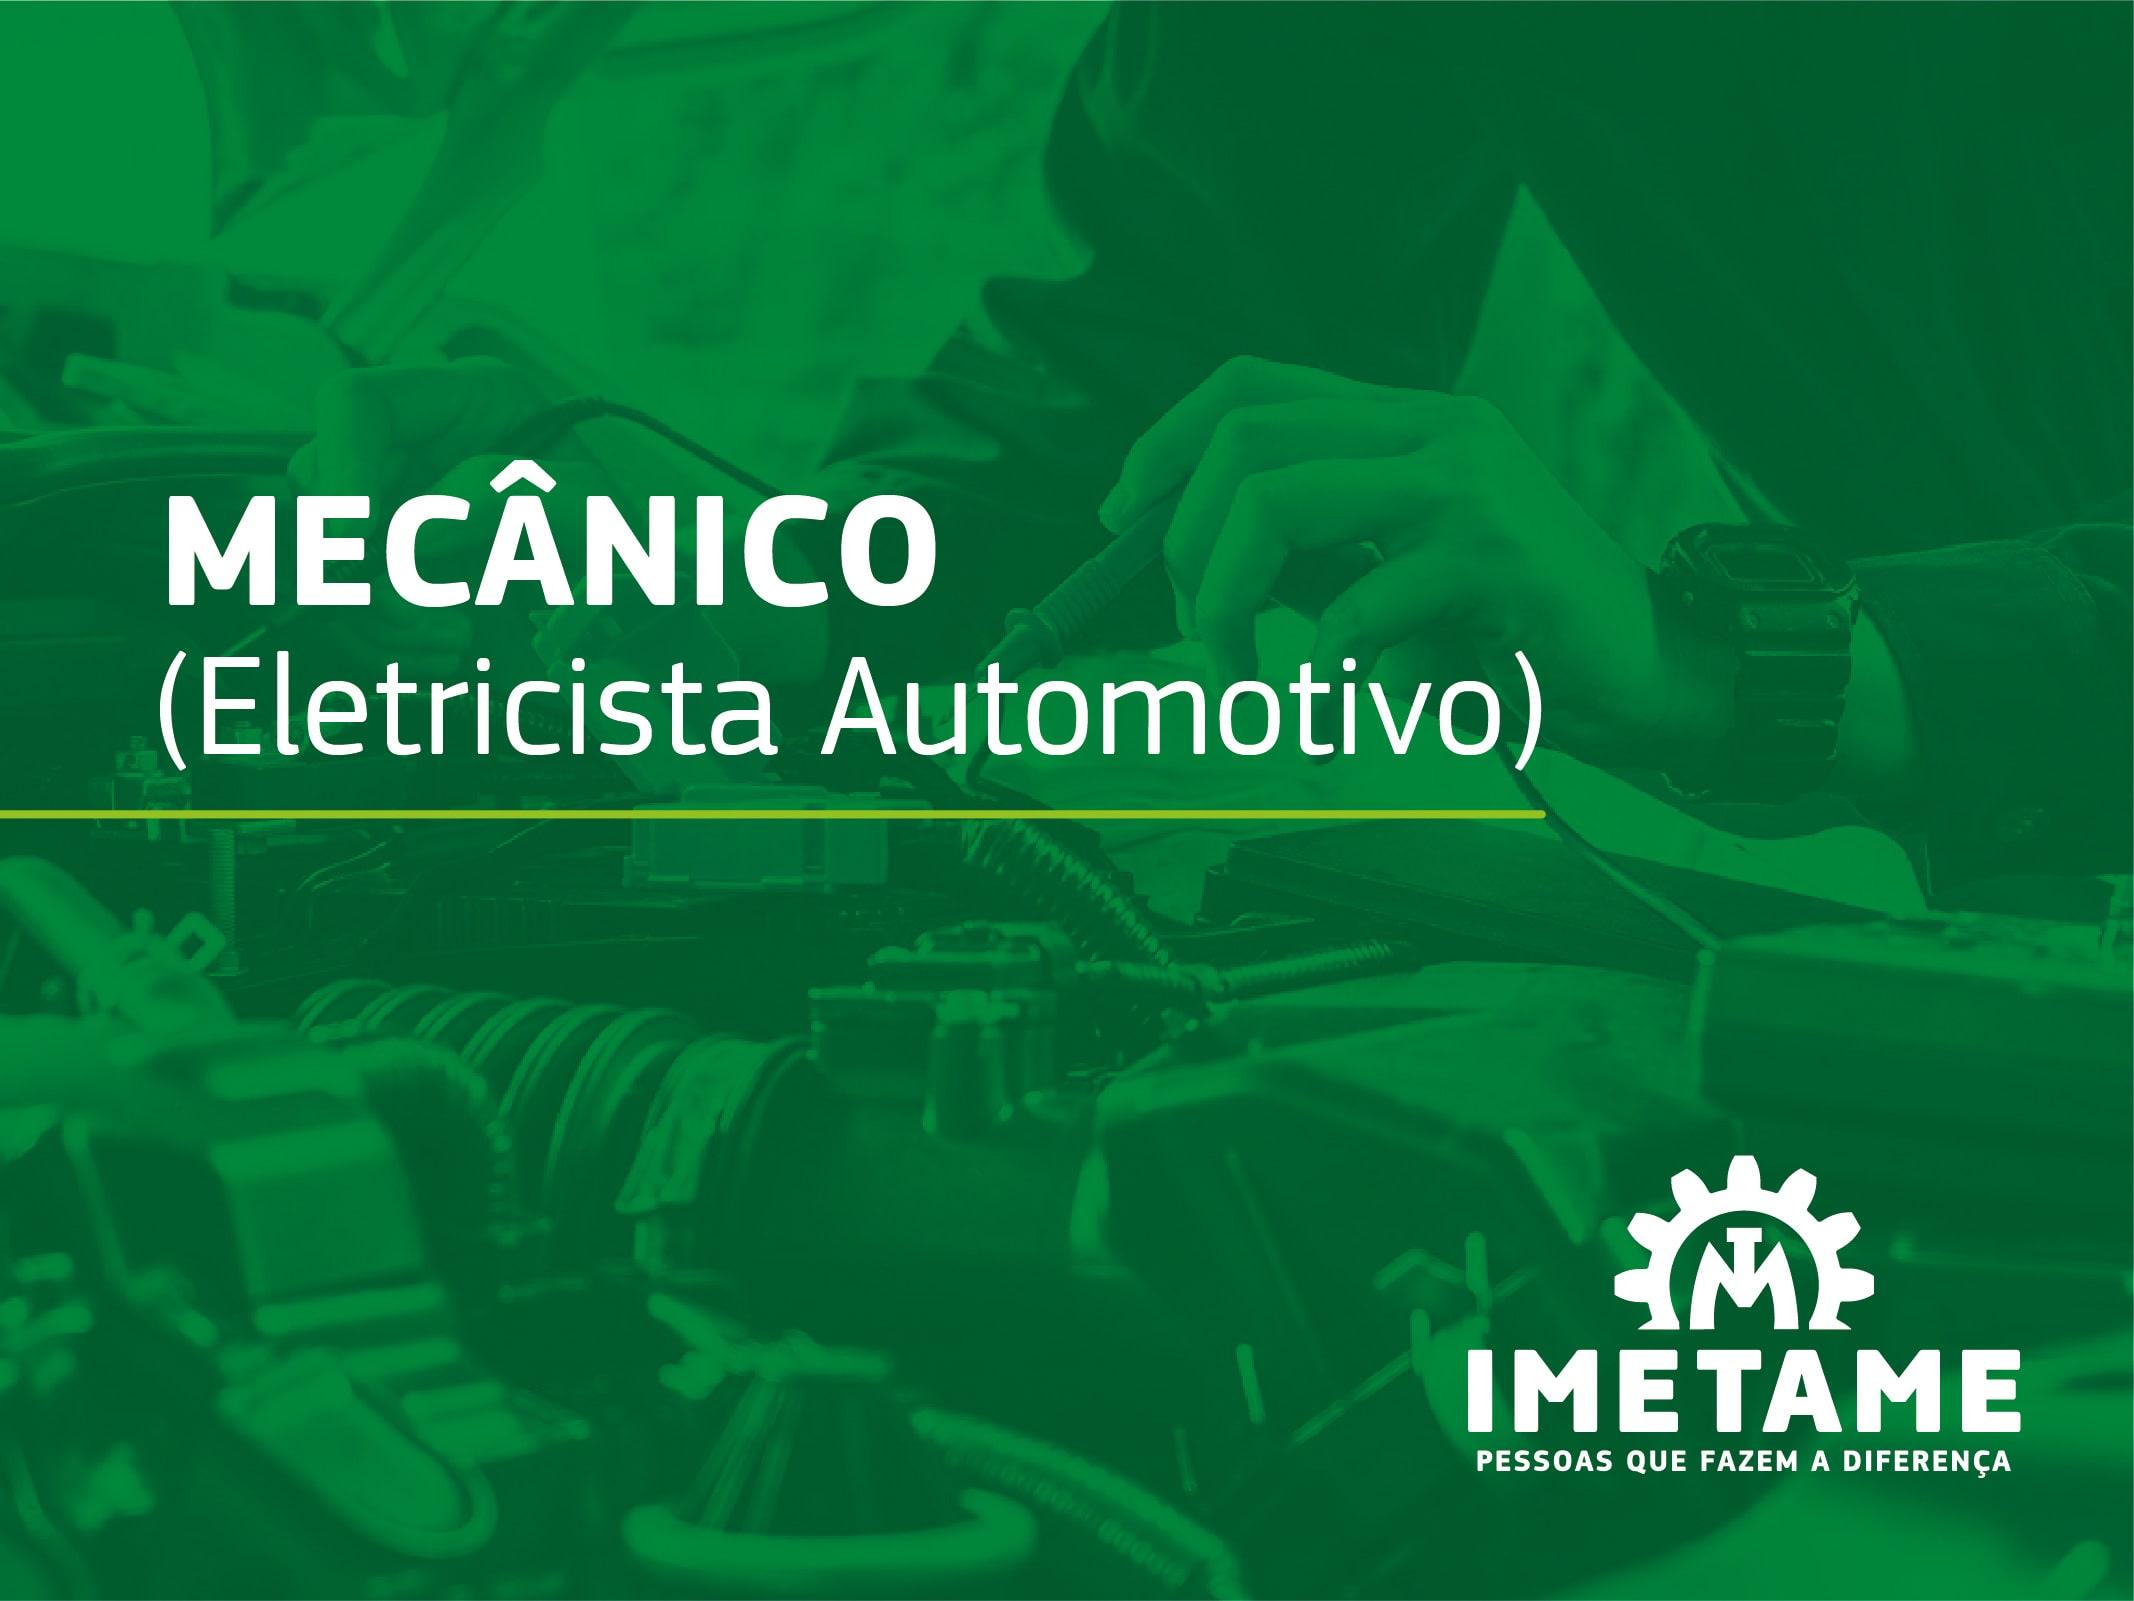 Mecânico – Eletricista Automotivo